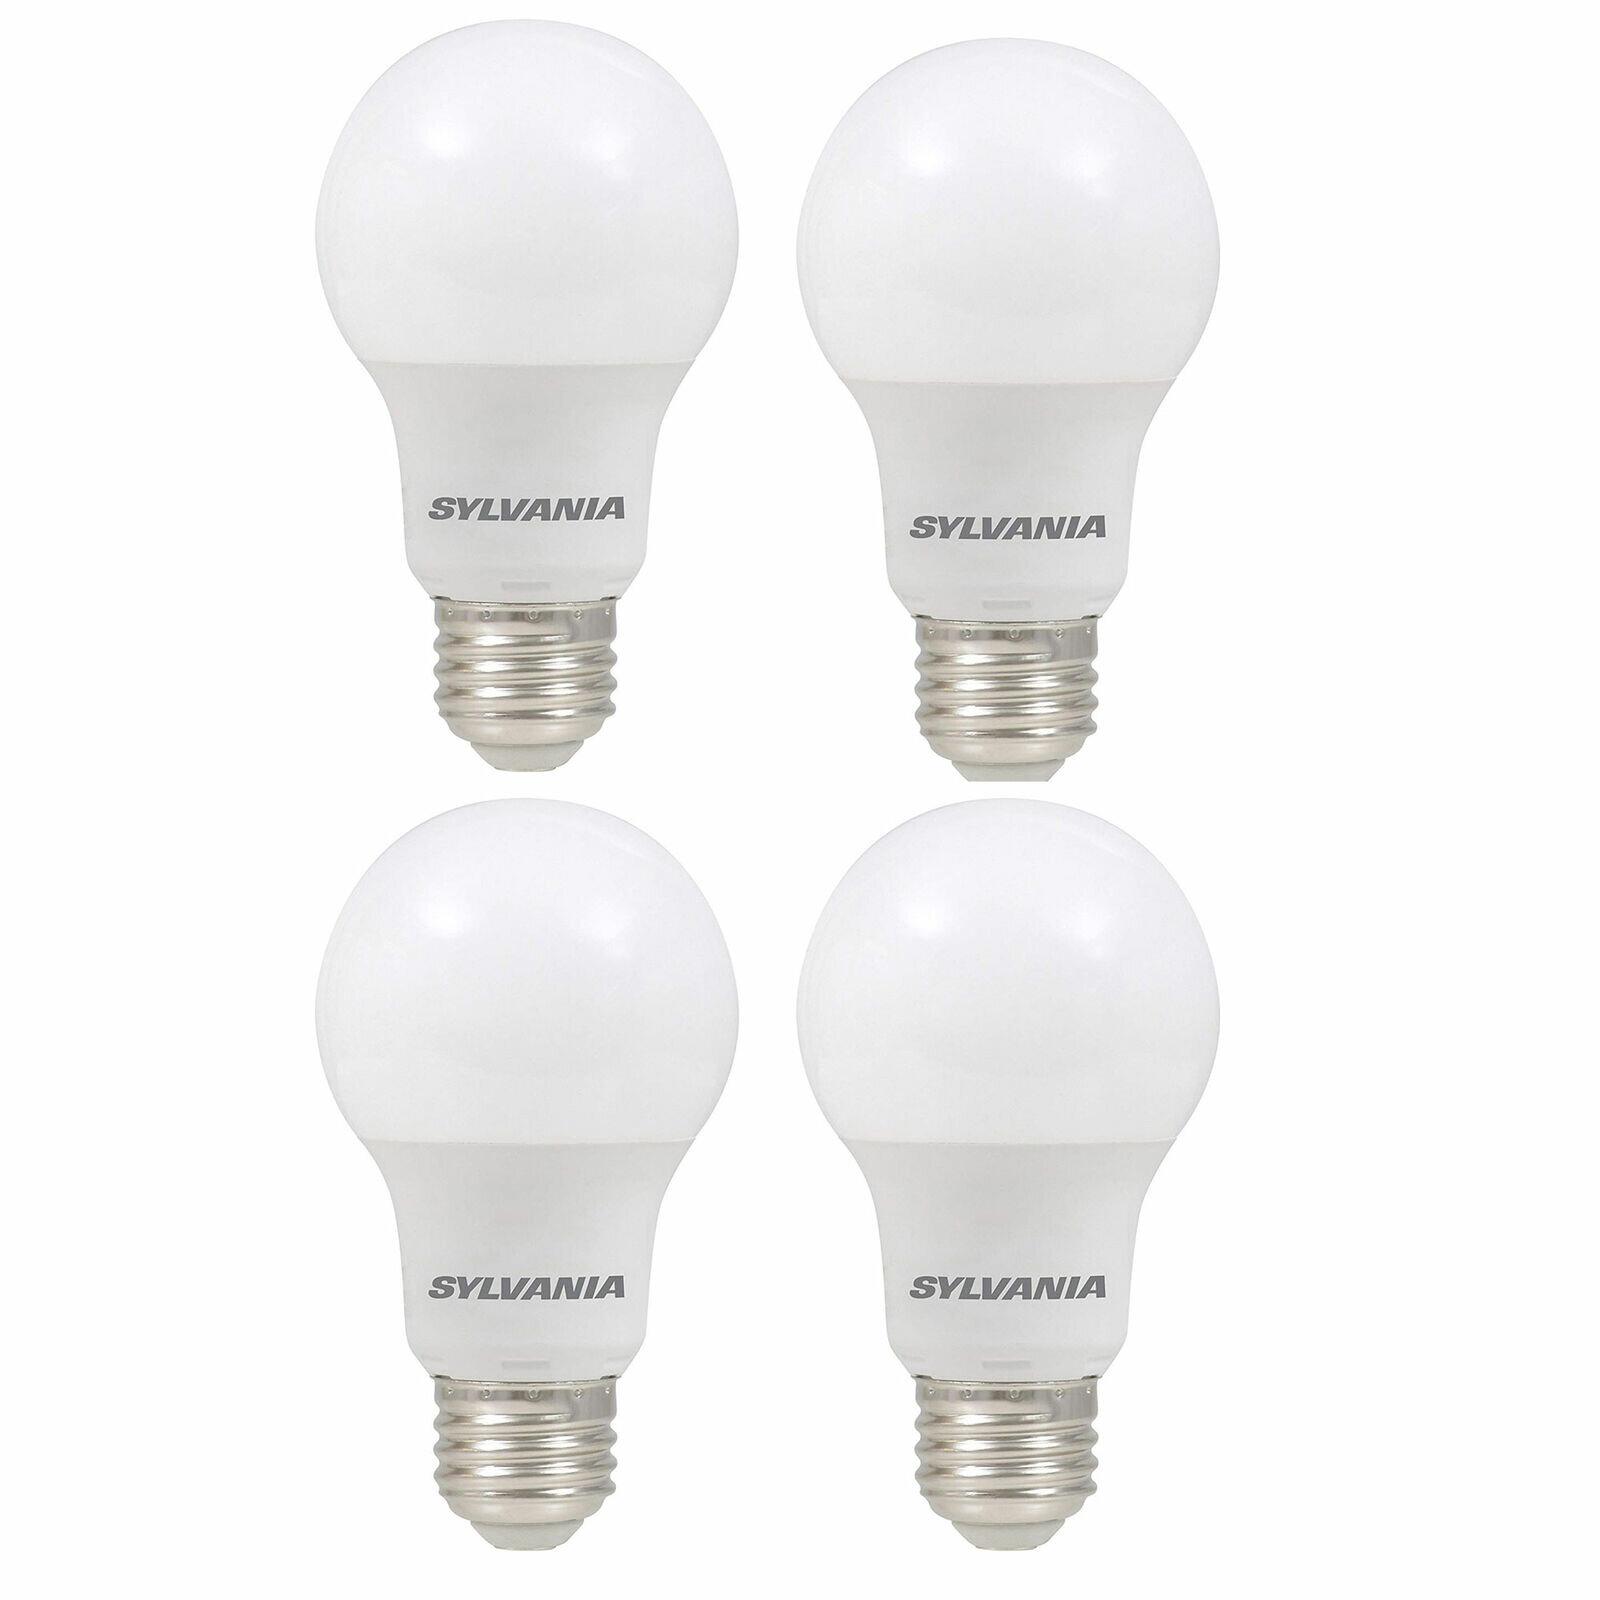 Sylvania 60 Watt Equivalent LED Energy-Saving Light Bulbs (4-pack)   Reg Price: $50   Today's Price: $25 (50% off!)    via eBay